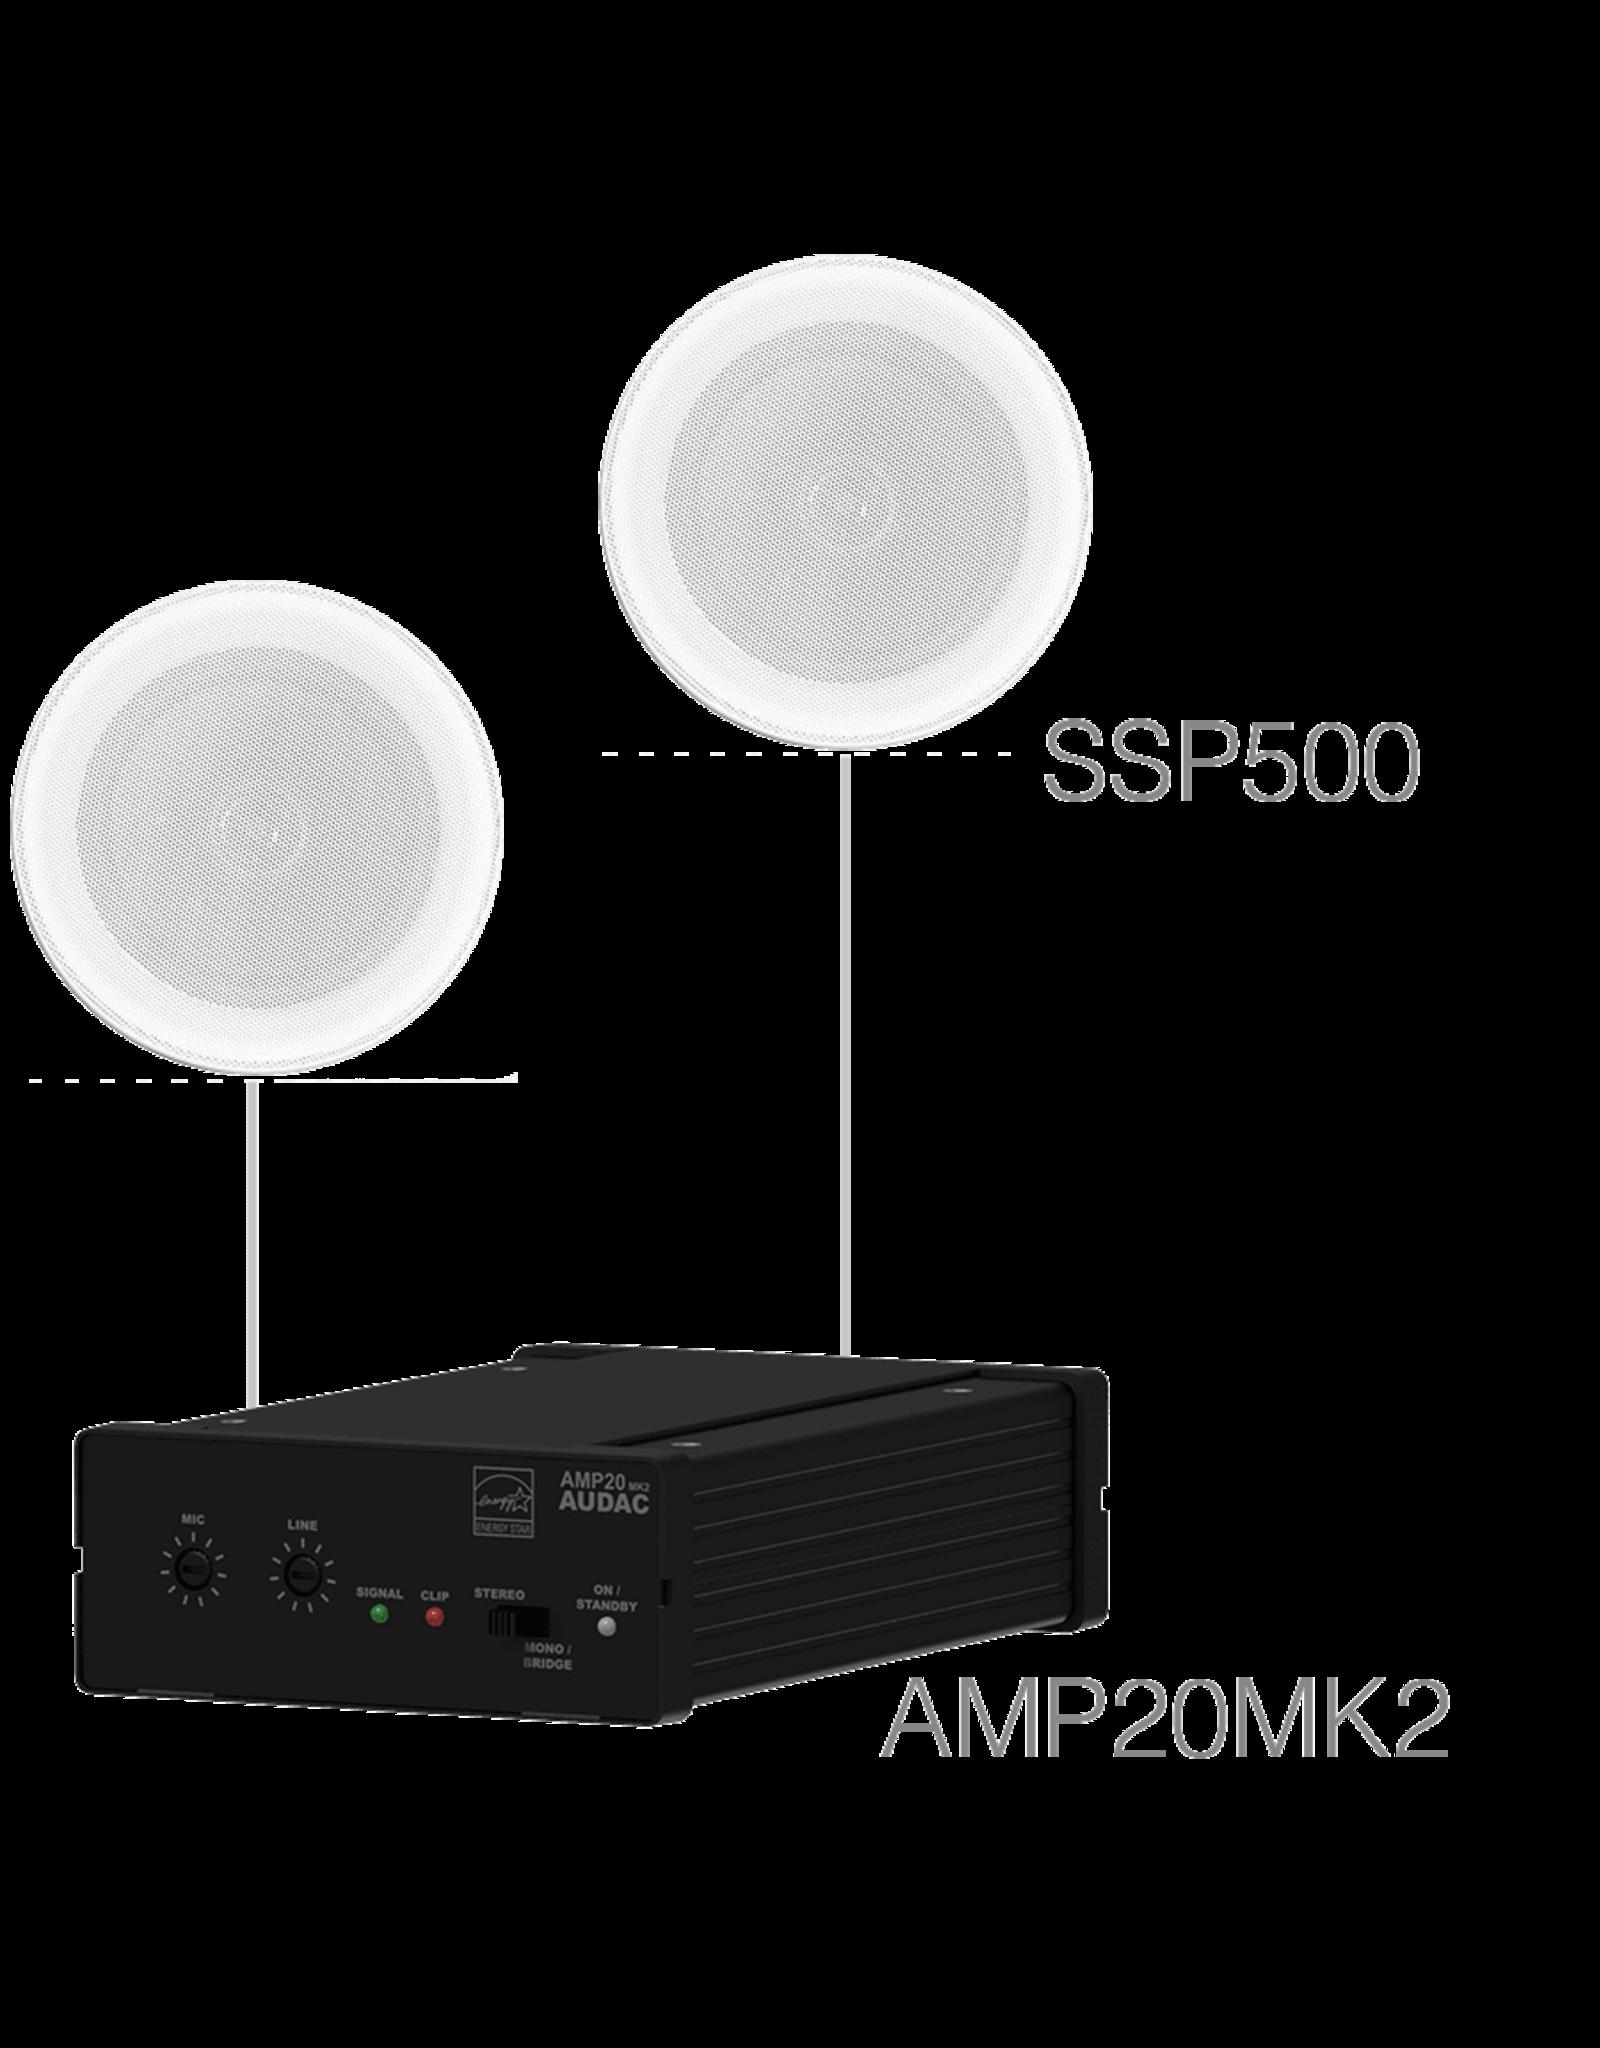 Audac 2 x SSP500 + AMP20 Humid proof background set 2 x SSP500 + AMP20MK2 - white